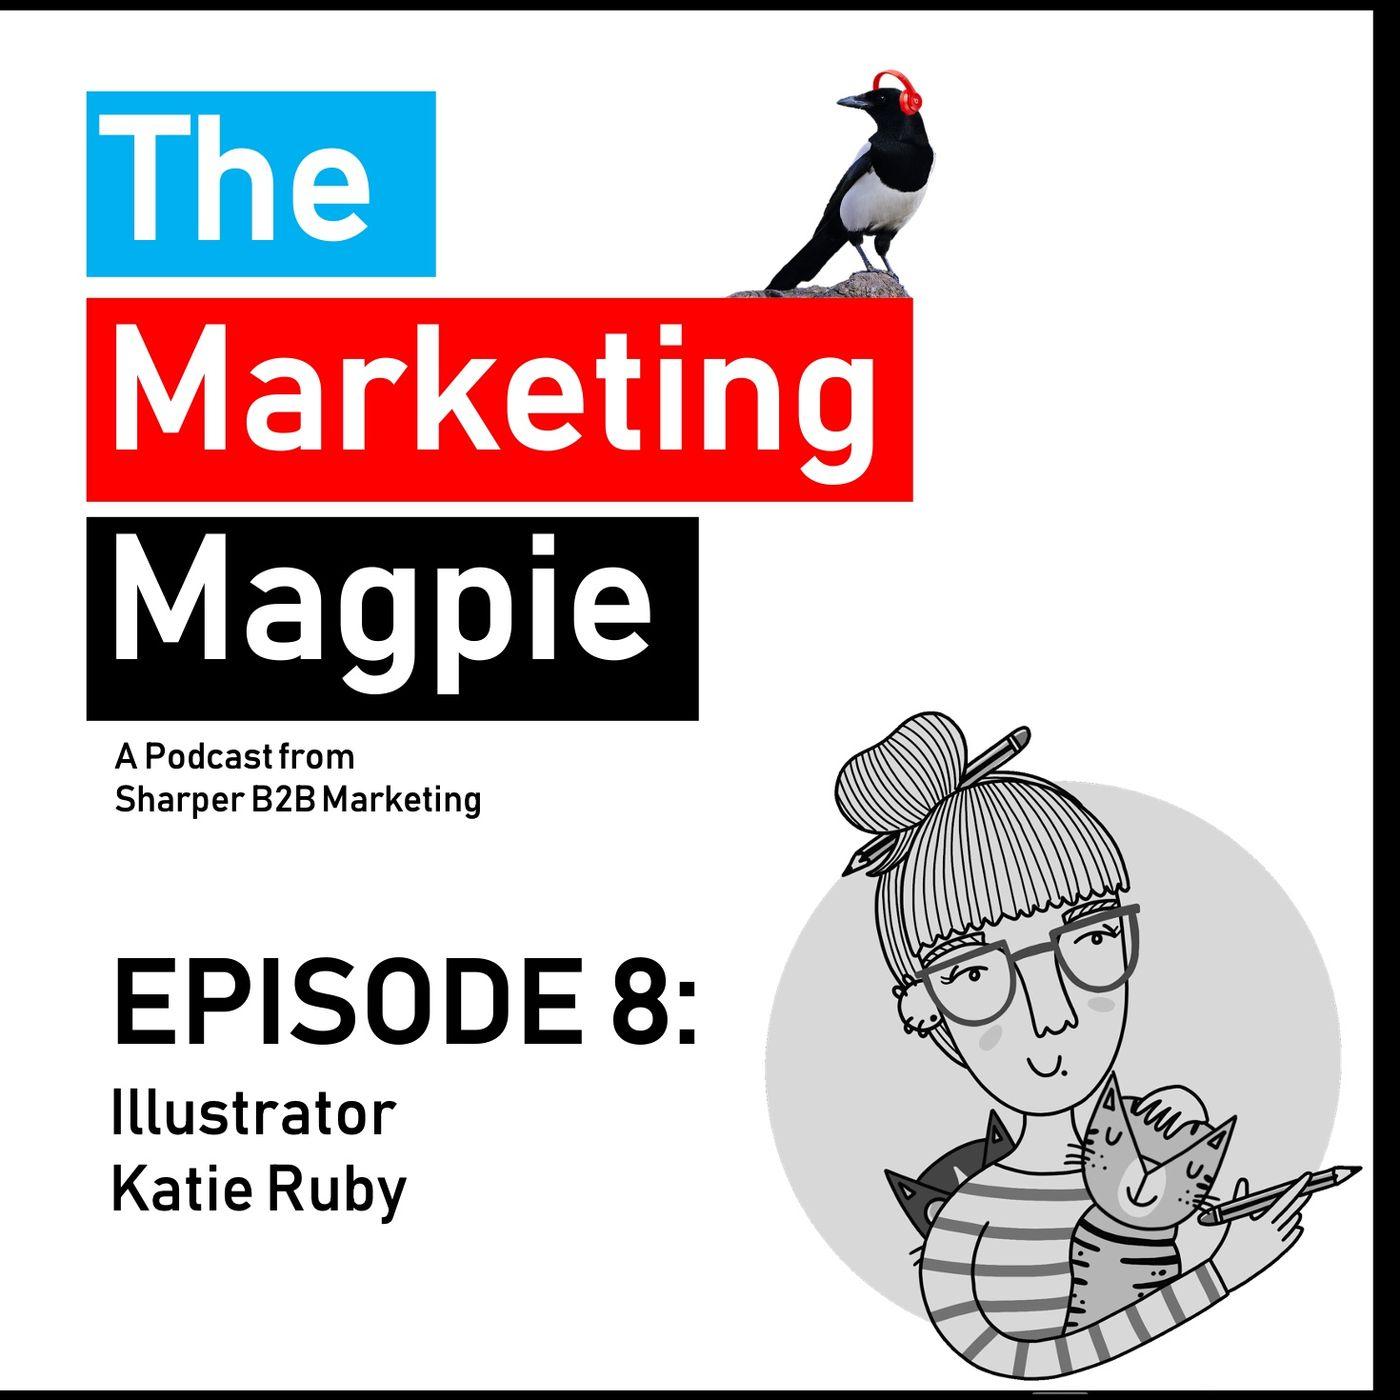 The Marketing Magpie - Episode 8 - Illustrator Katie Ruby